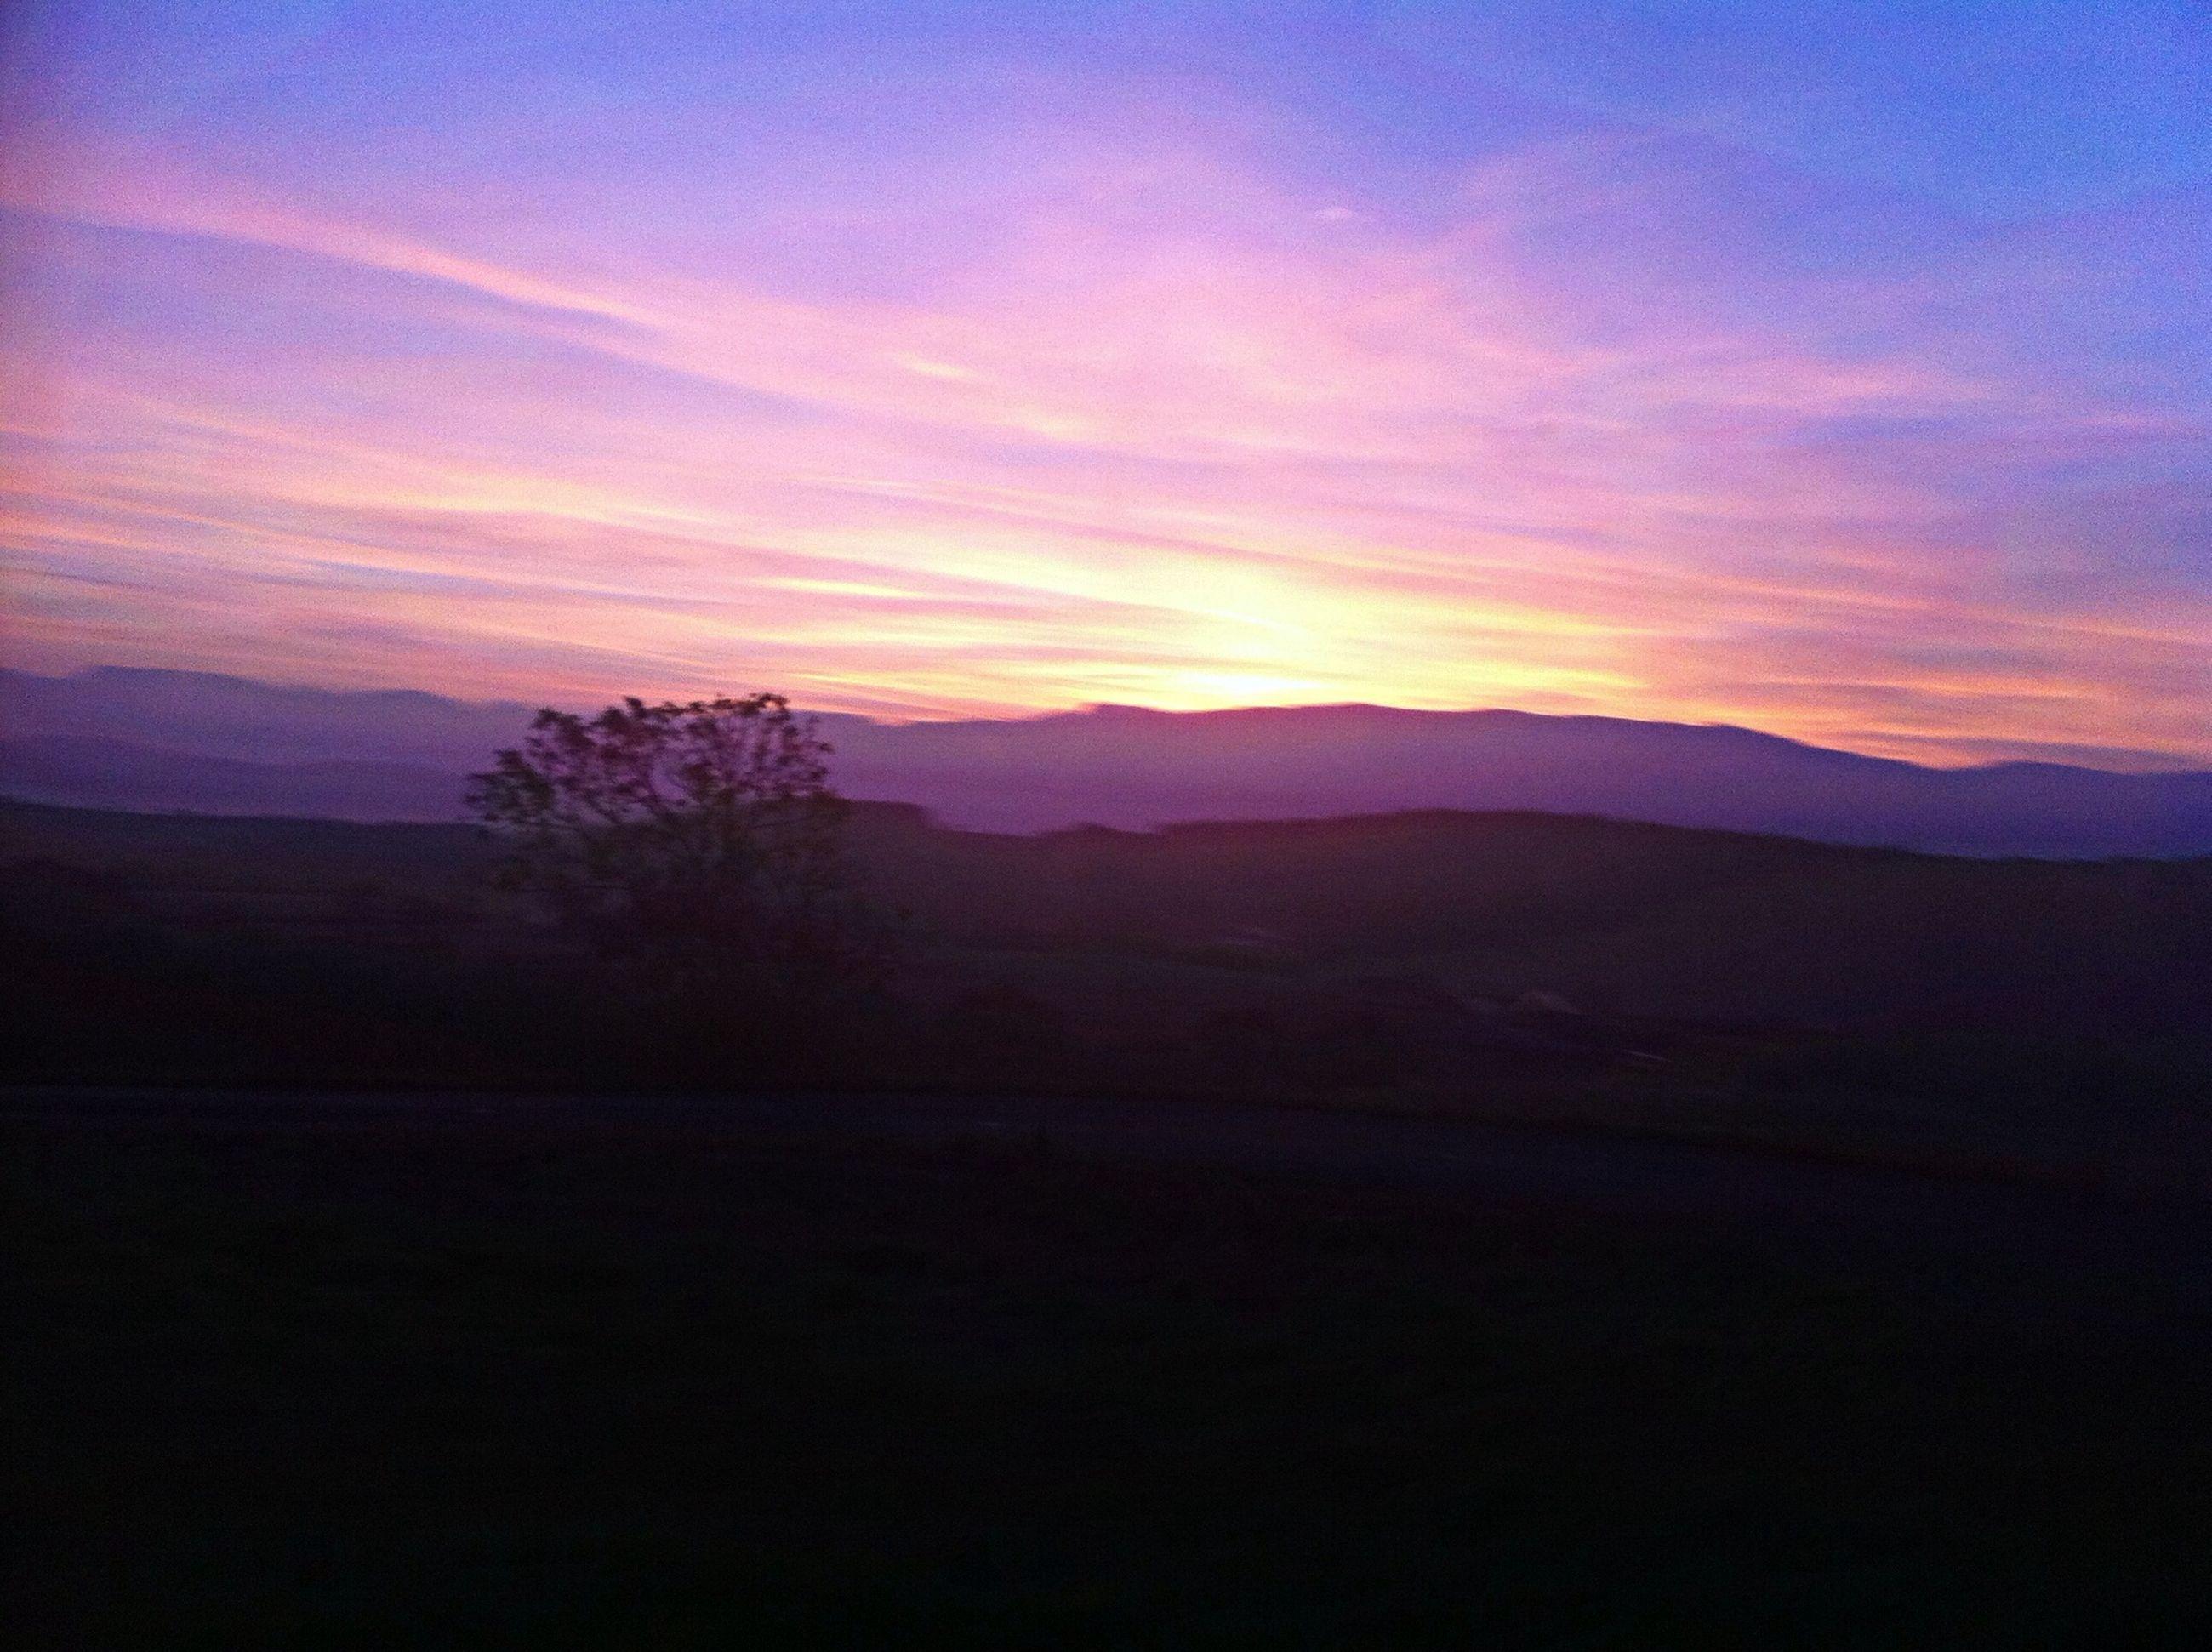 sunset, tranquil scene, scenics, tranquility, silhouette, mountain, beauty in nature, landscape, sky, mountain range, nature, idyllic, orange color, cloud - sky, non-urban scene, dusk, majestic, cloud, remote, dark